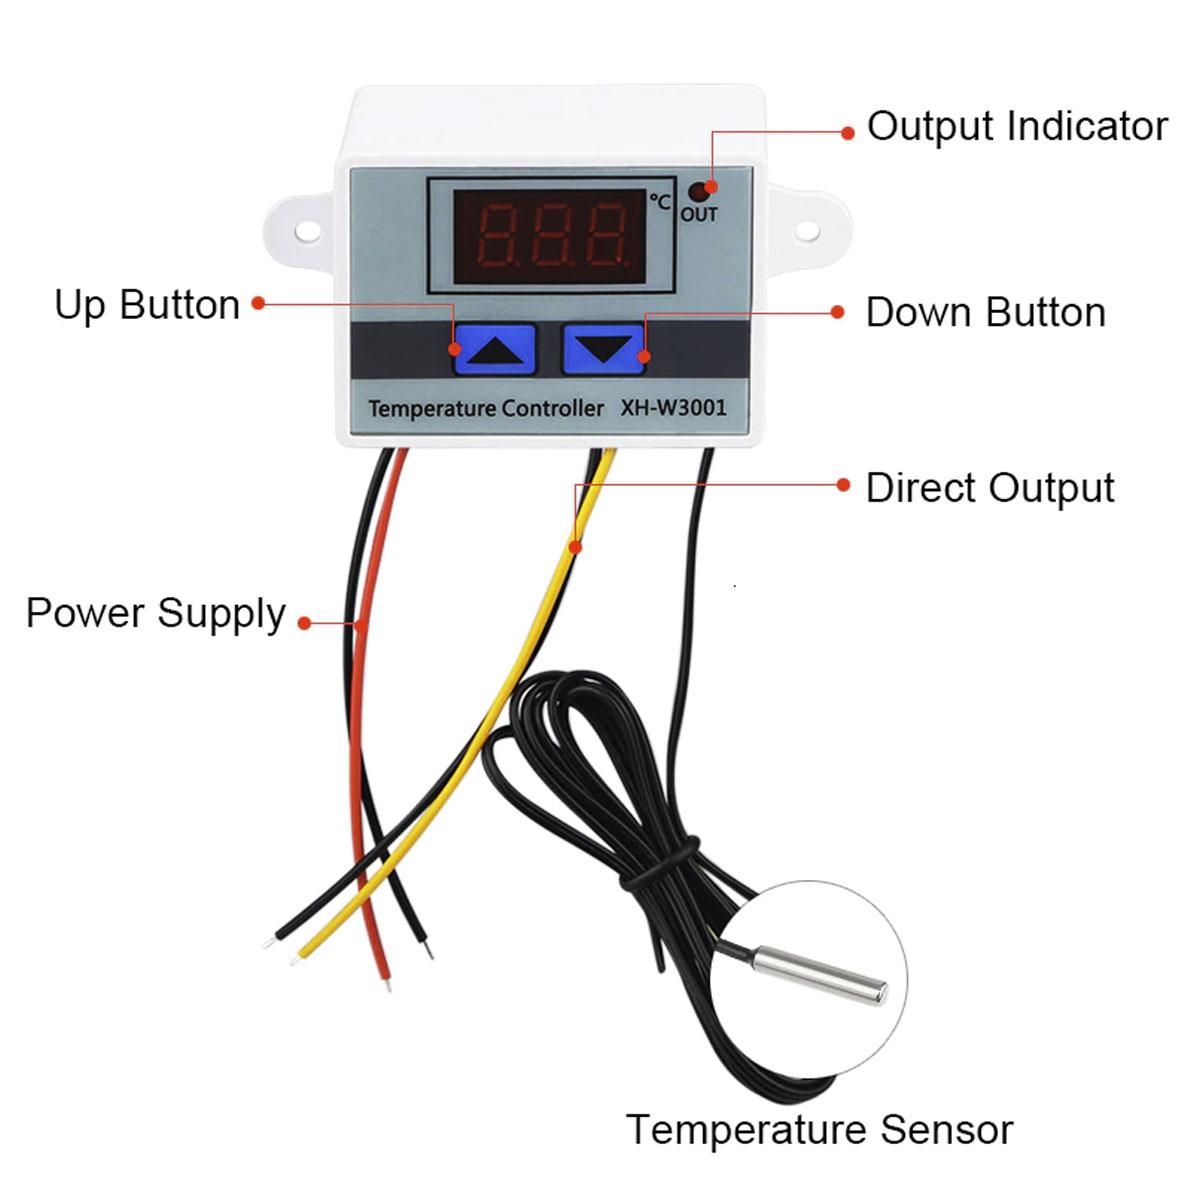 Controlador de Temperatura Digital Termostato 110 / 220V AC XH-W3001